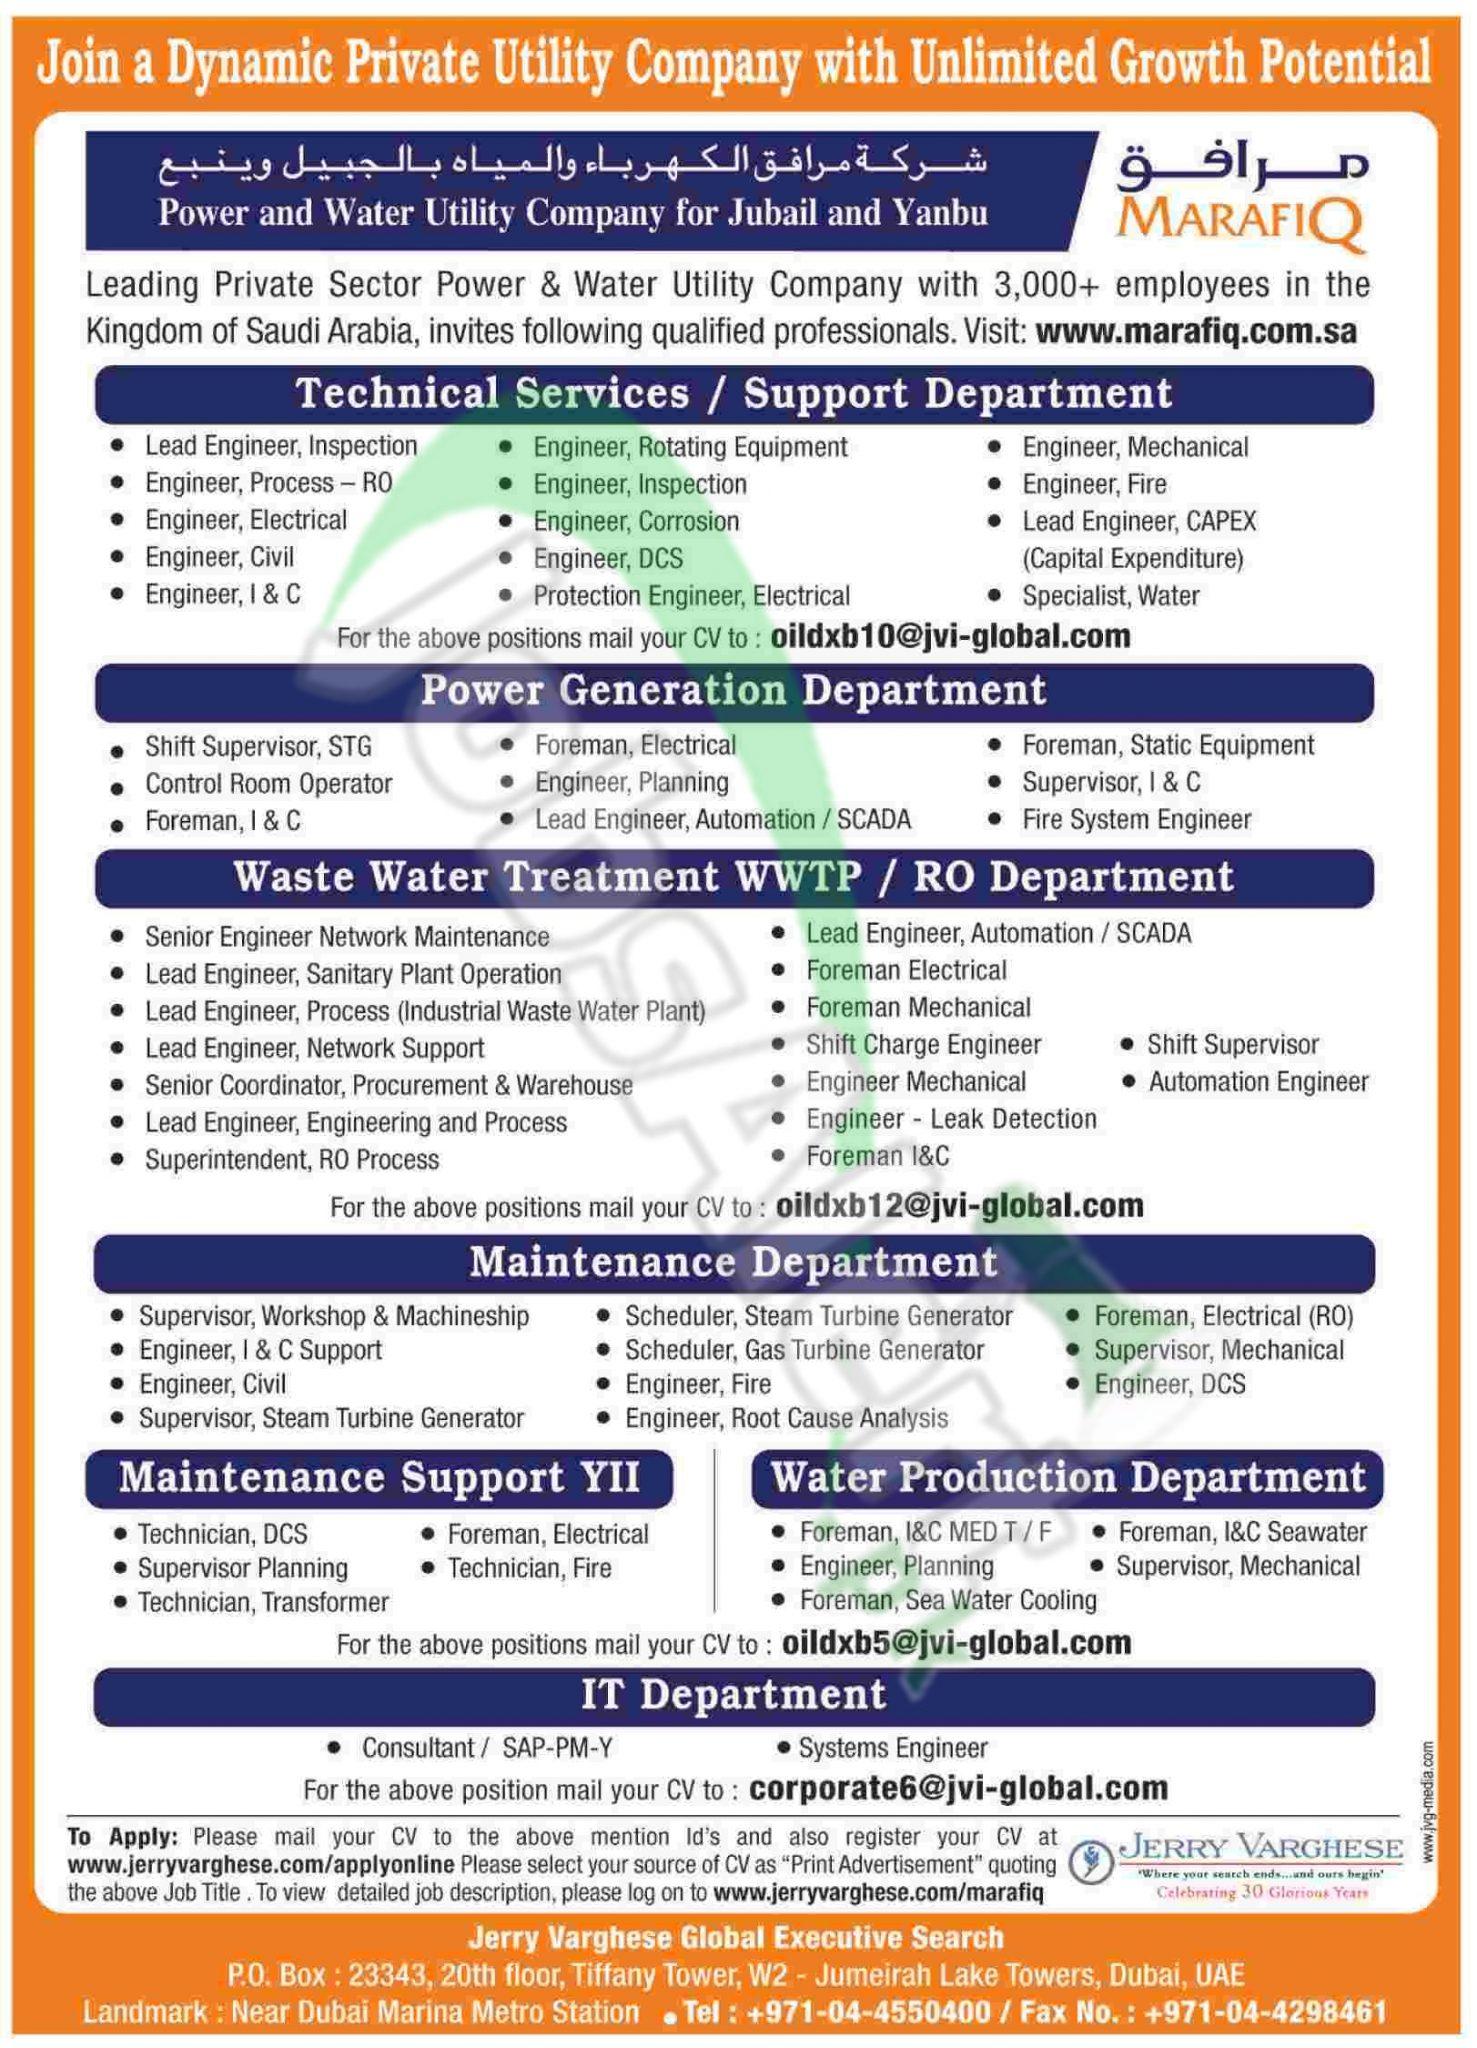 power water utility company jobs vacancies 2014 in saudi arabia